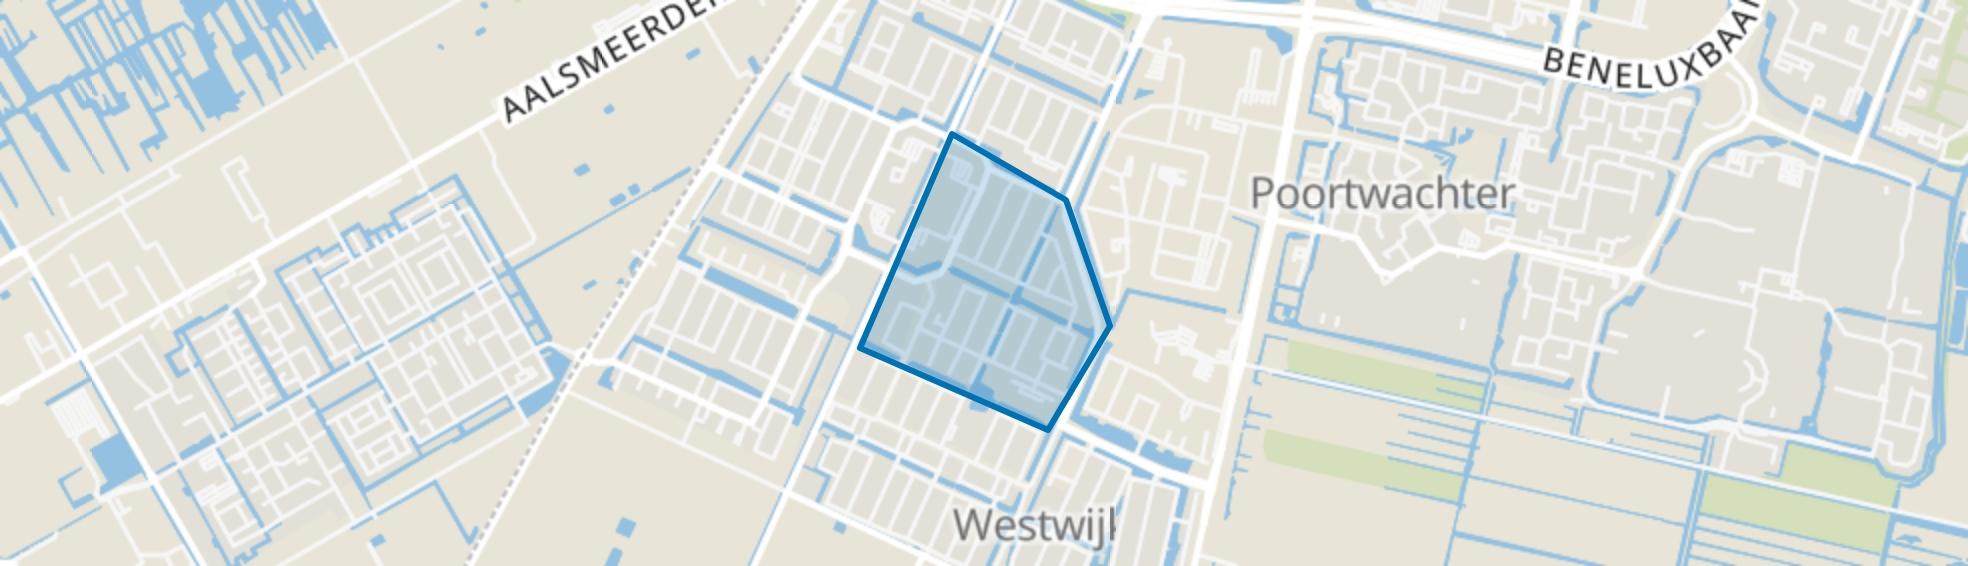 Theaterbuurt, Amstelveen map